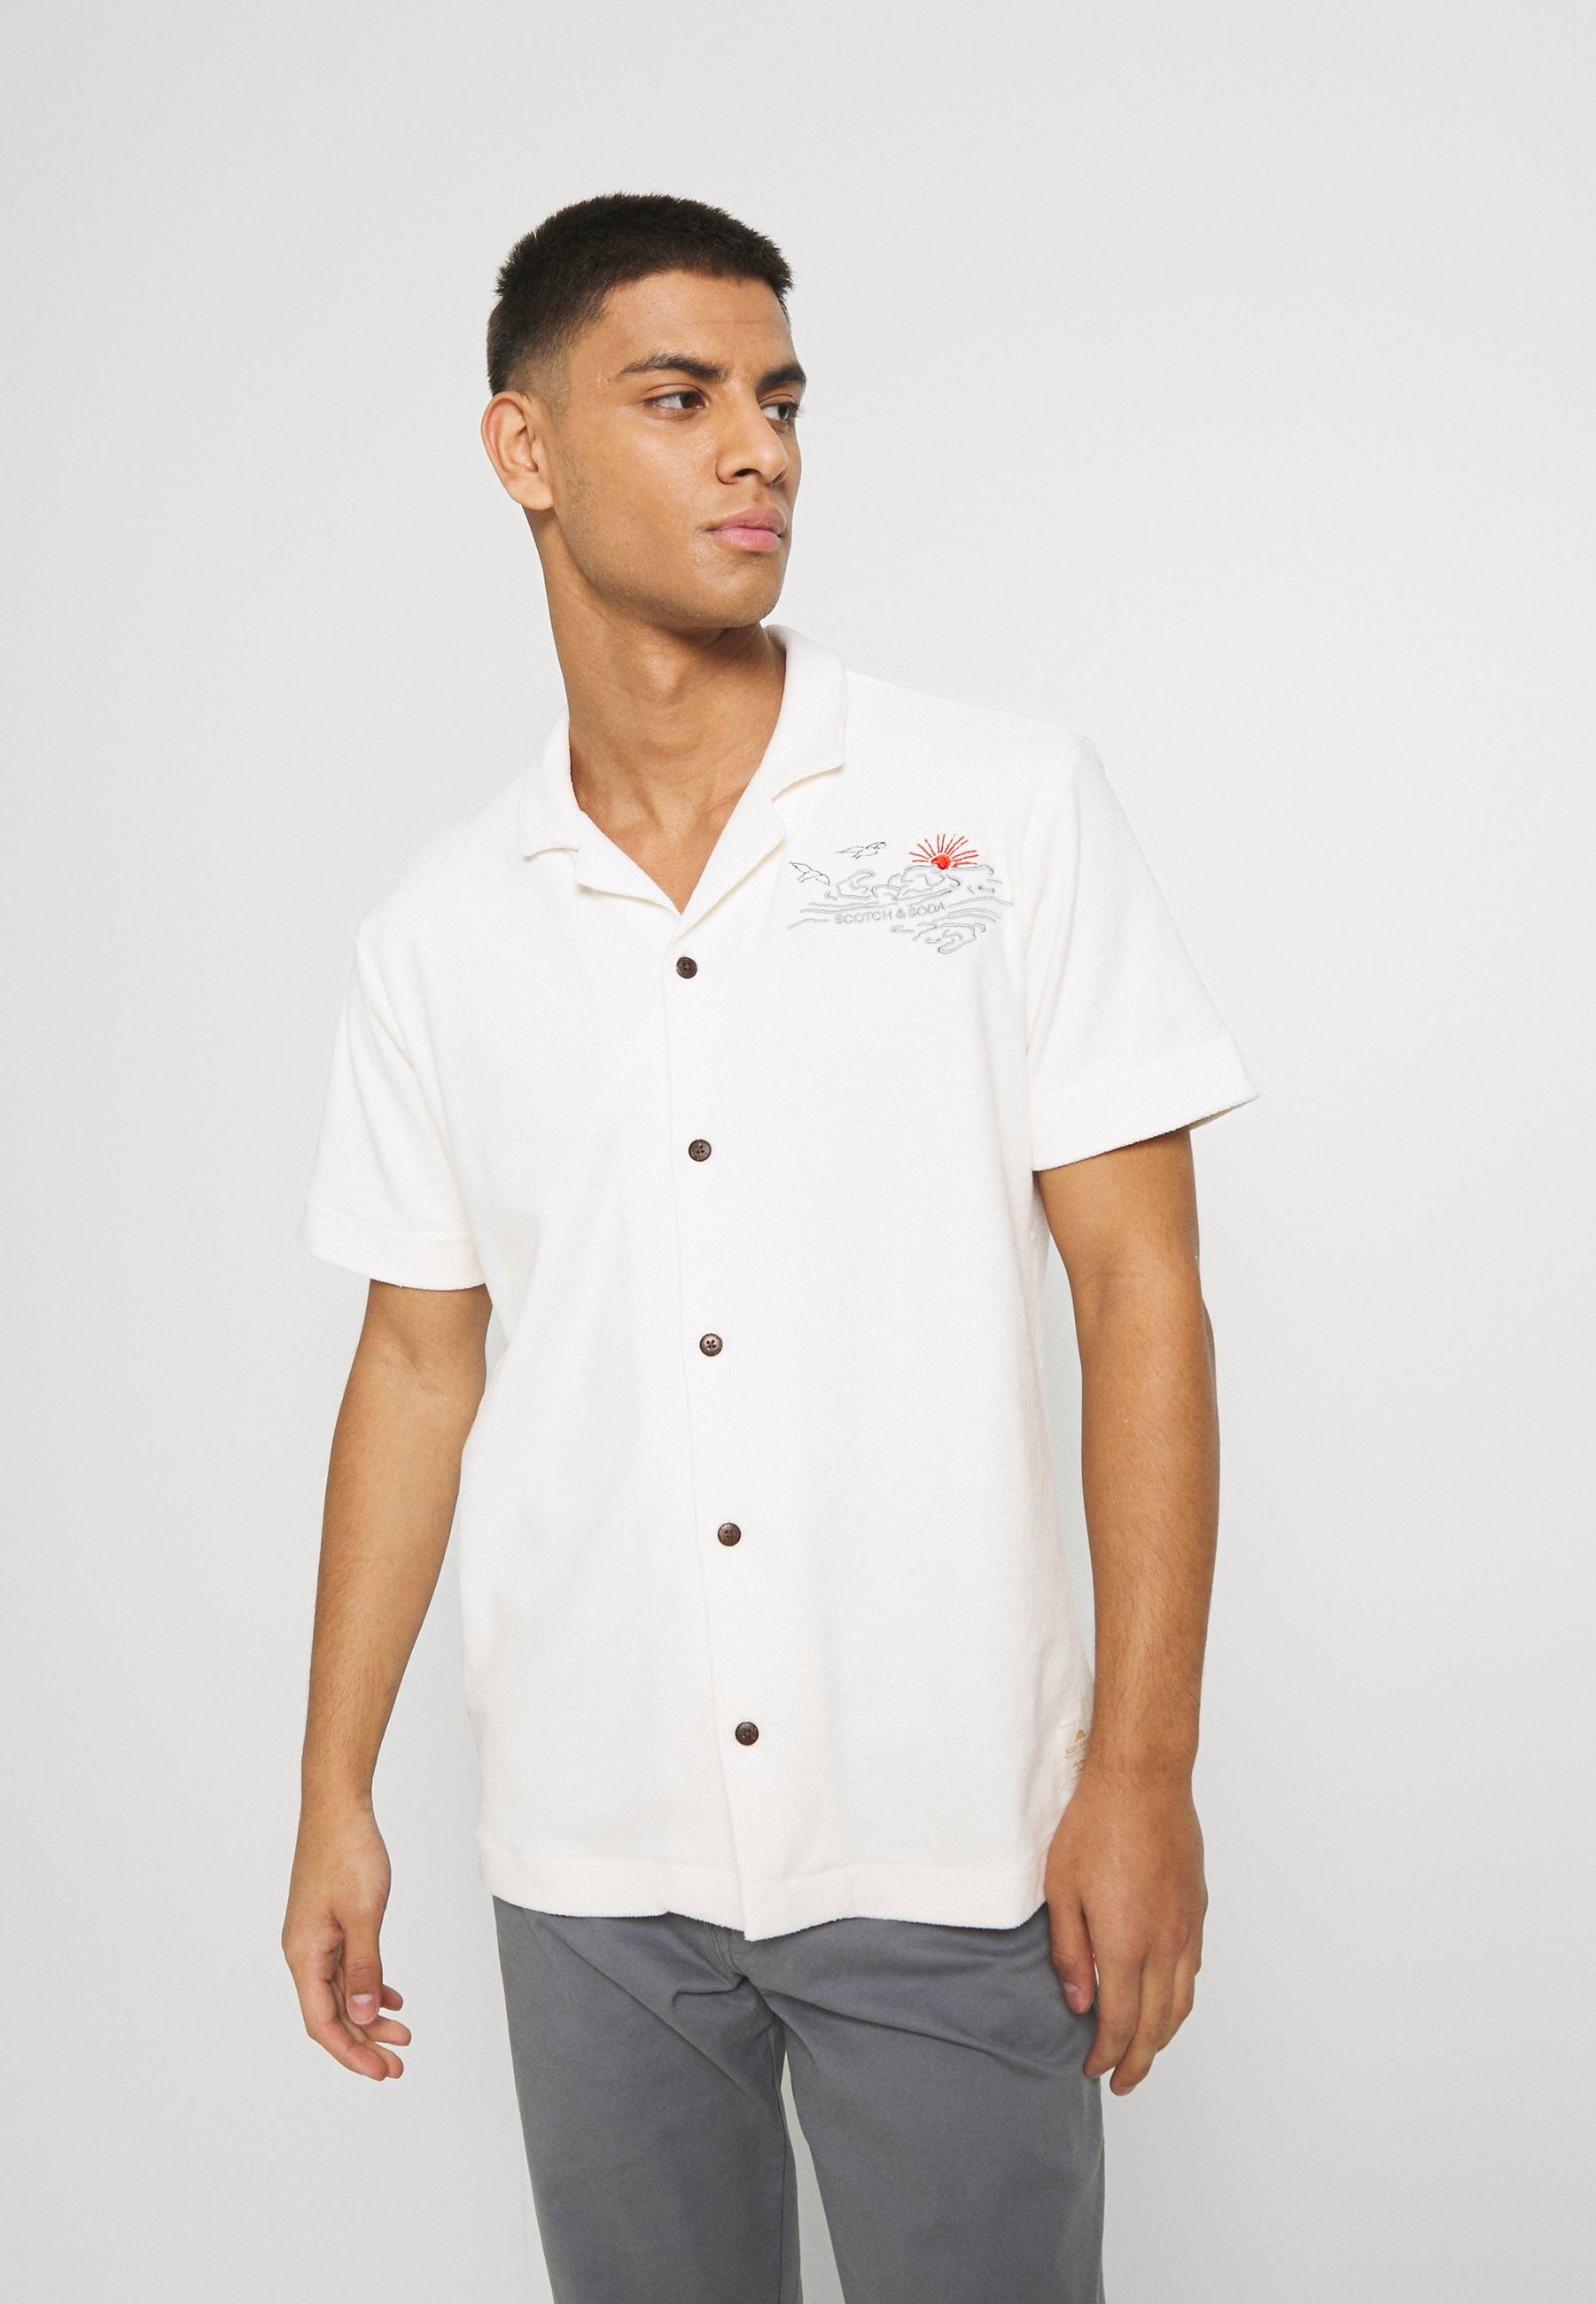 Uomo HAWAII SHIRT WITH EMBROIDERIES - Camicia